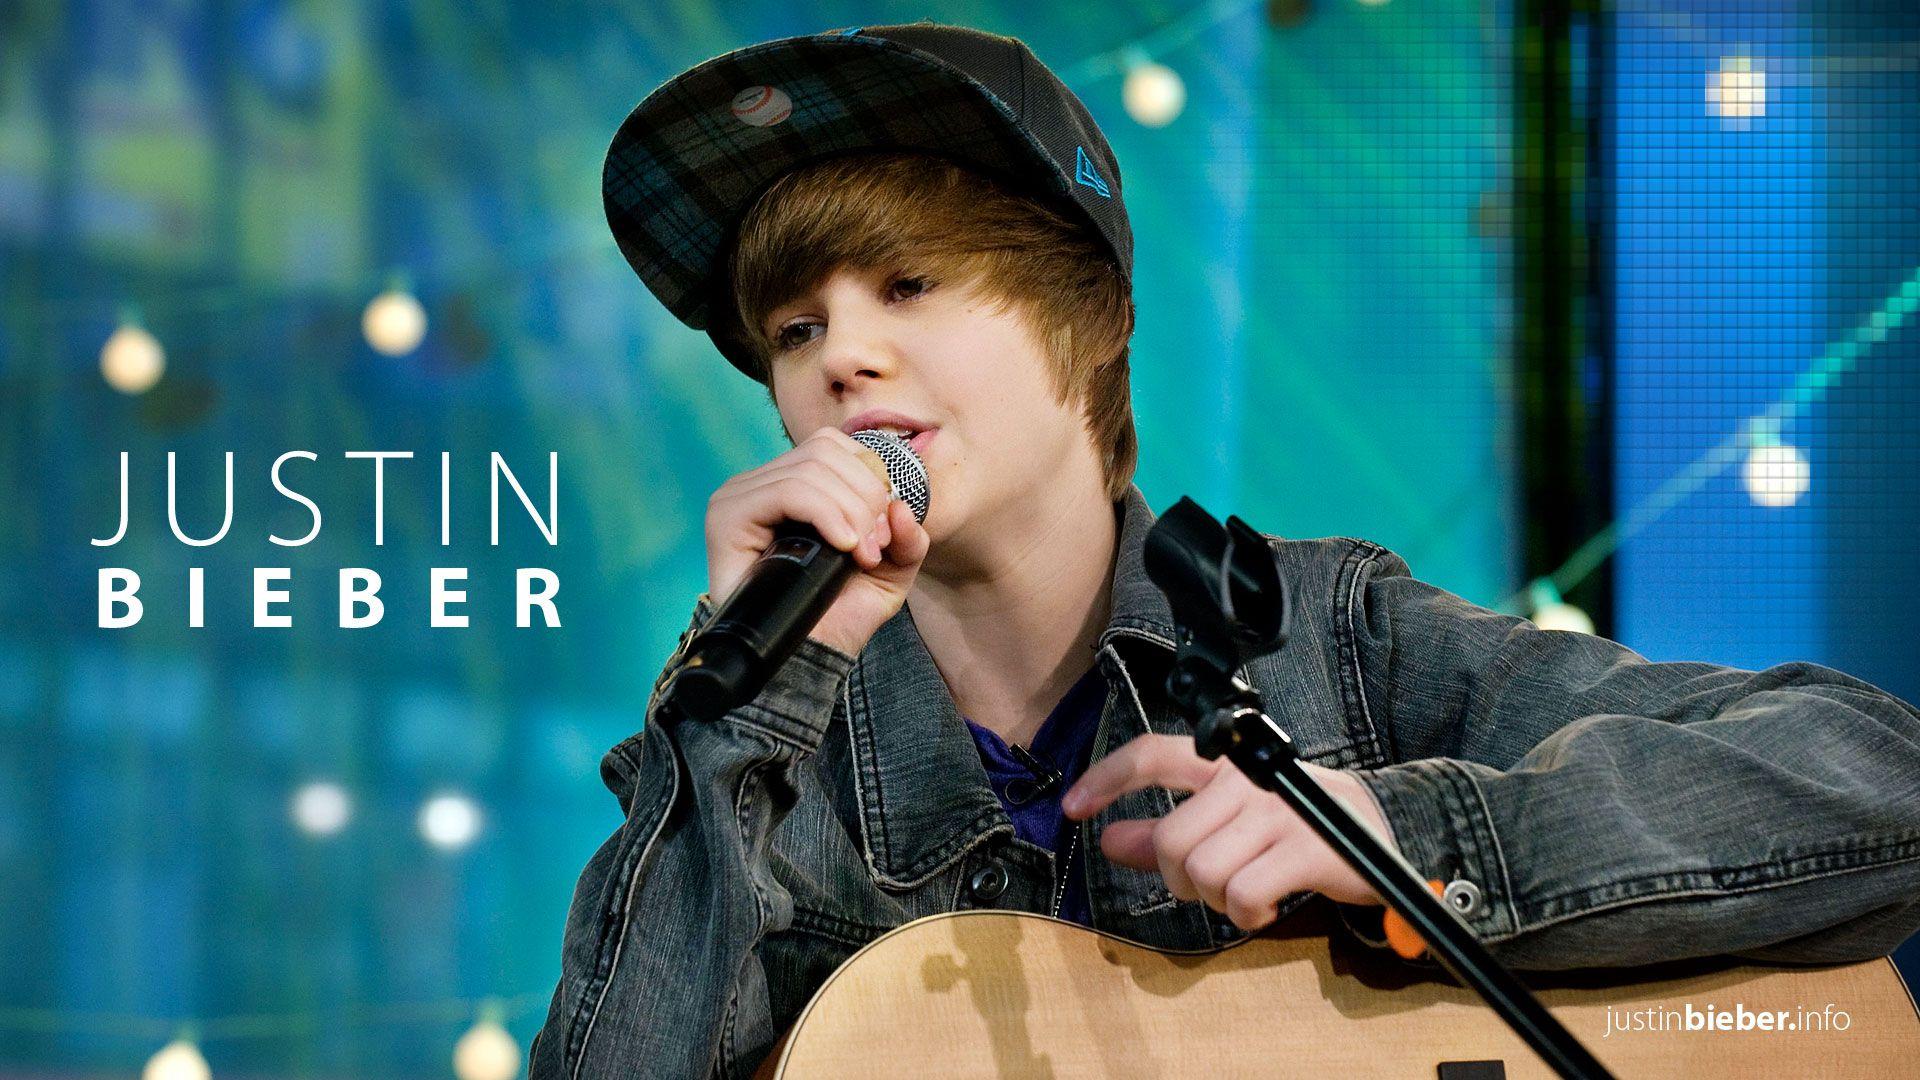 Justin Bieber Wallpapers HD 2017 - Wallpaper Cave